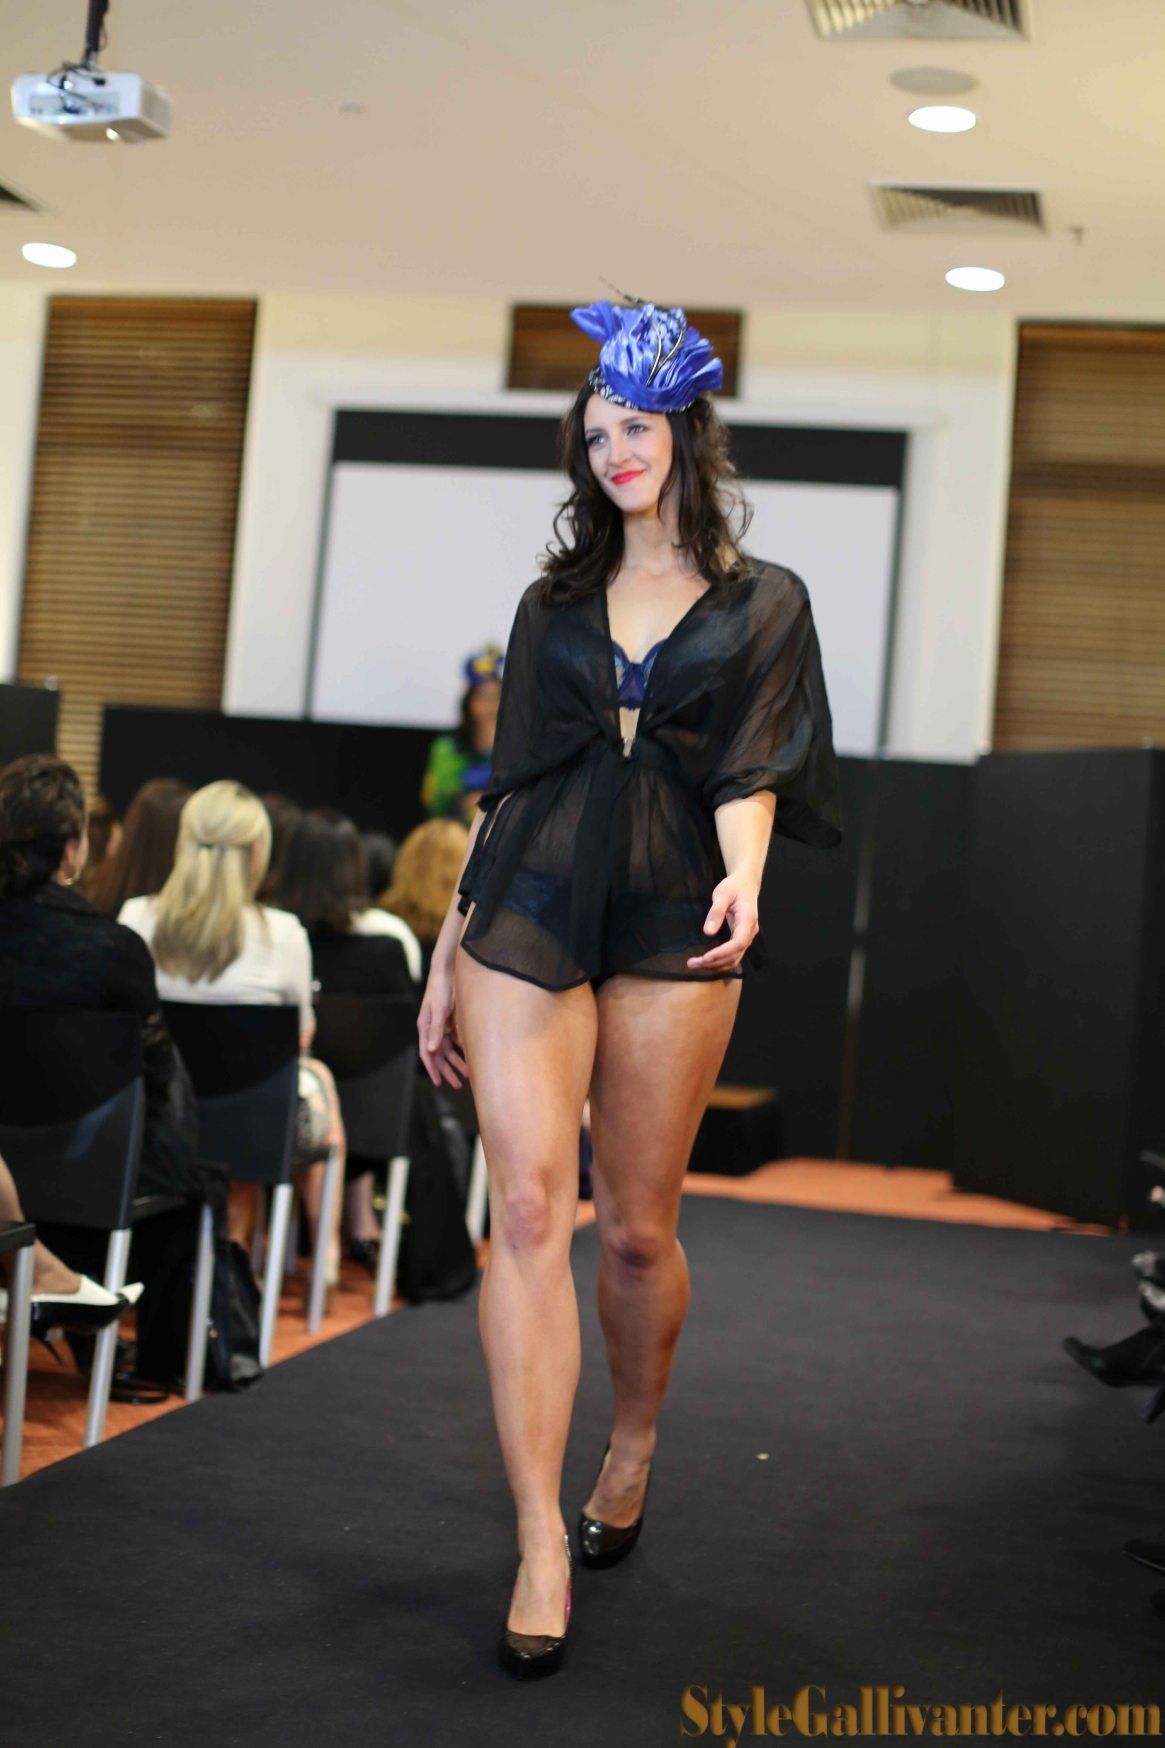 polka-dot-editorials_ a-line-dress-editorials_vogue-editorials-polka-dots_best-personal-style-bloggers-africa_best-personal-style-bloggers-australia_africas-best-fashion-blog-36